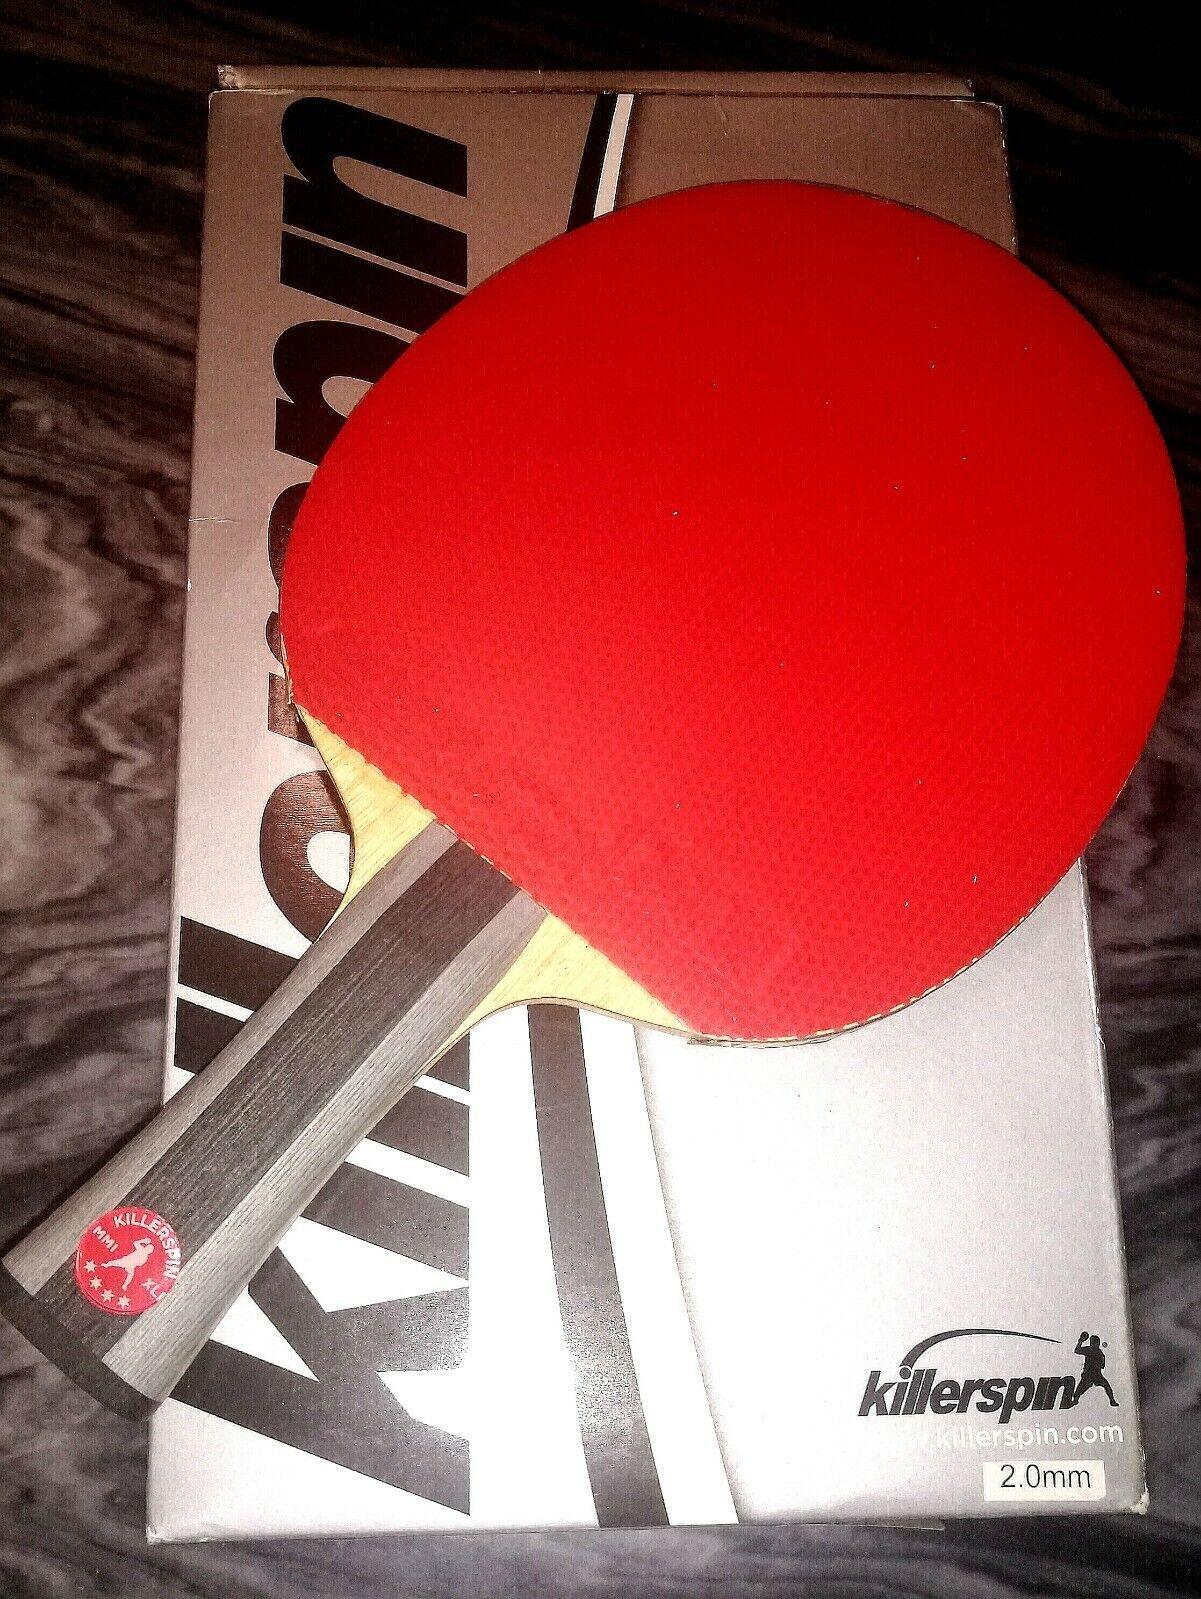 Killerspin 100-35 RTG Diamond TC Premium Table Tennis Paddle - FL